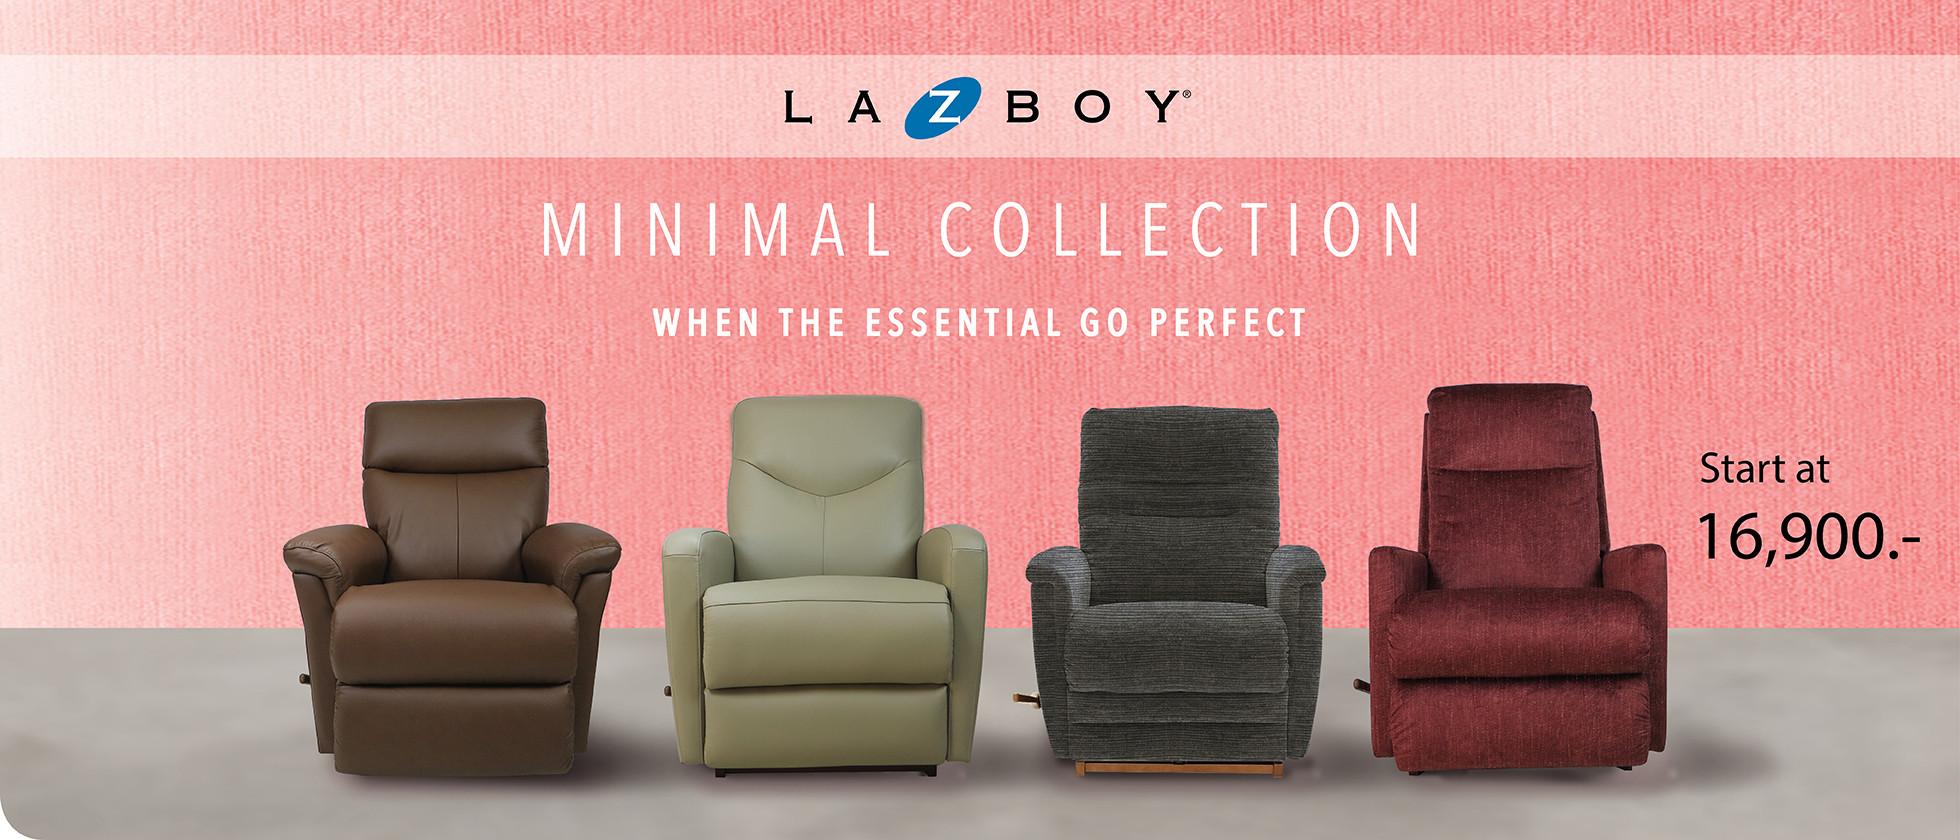 Minimal Collection